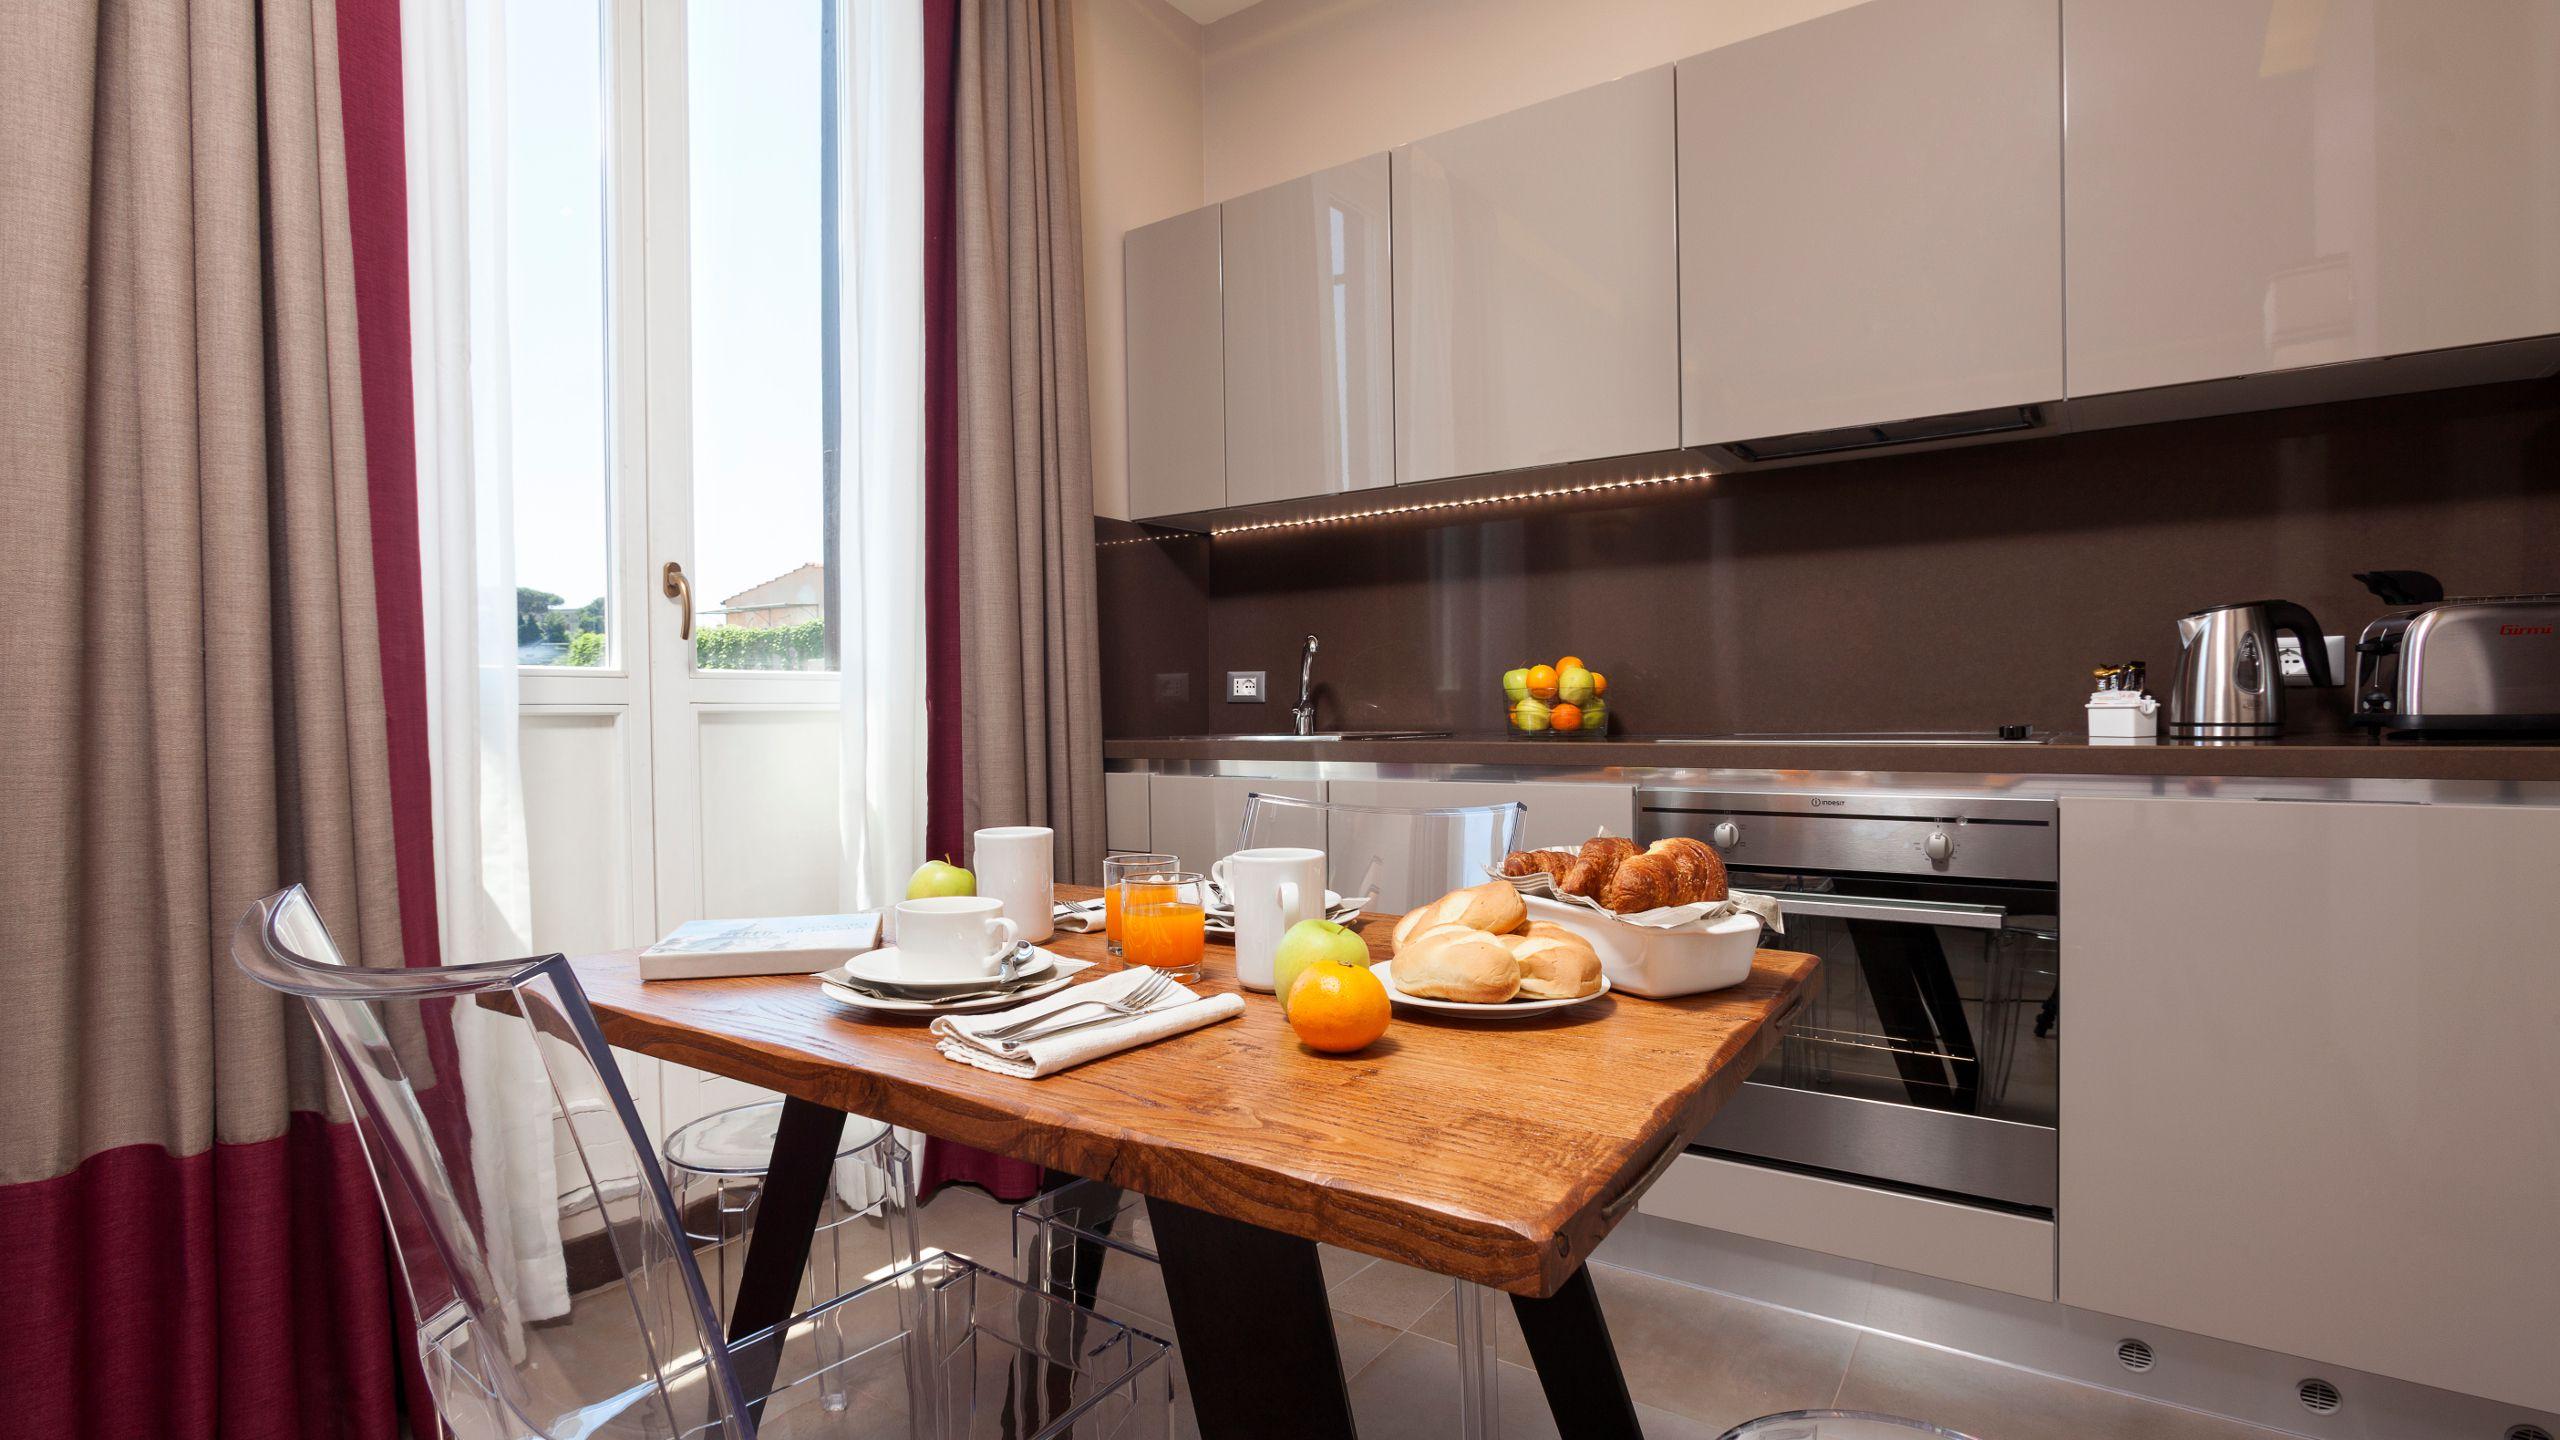 residence-trianon-roma-appartamenti-A24_010_(7087)_AltaRis.jpg